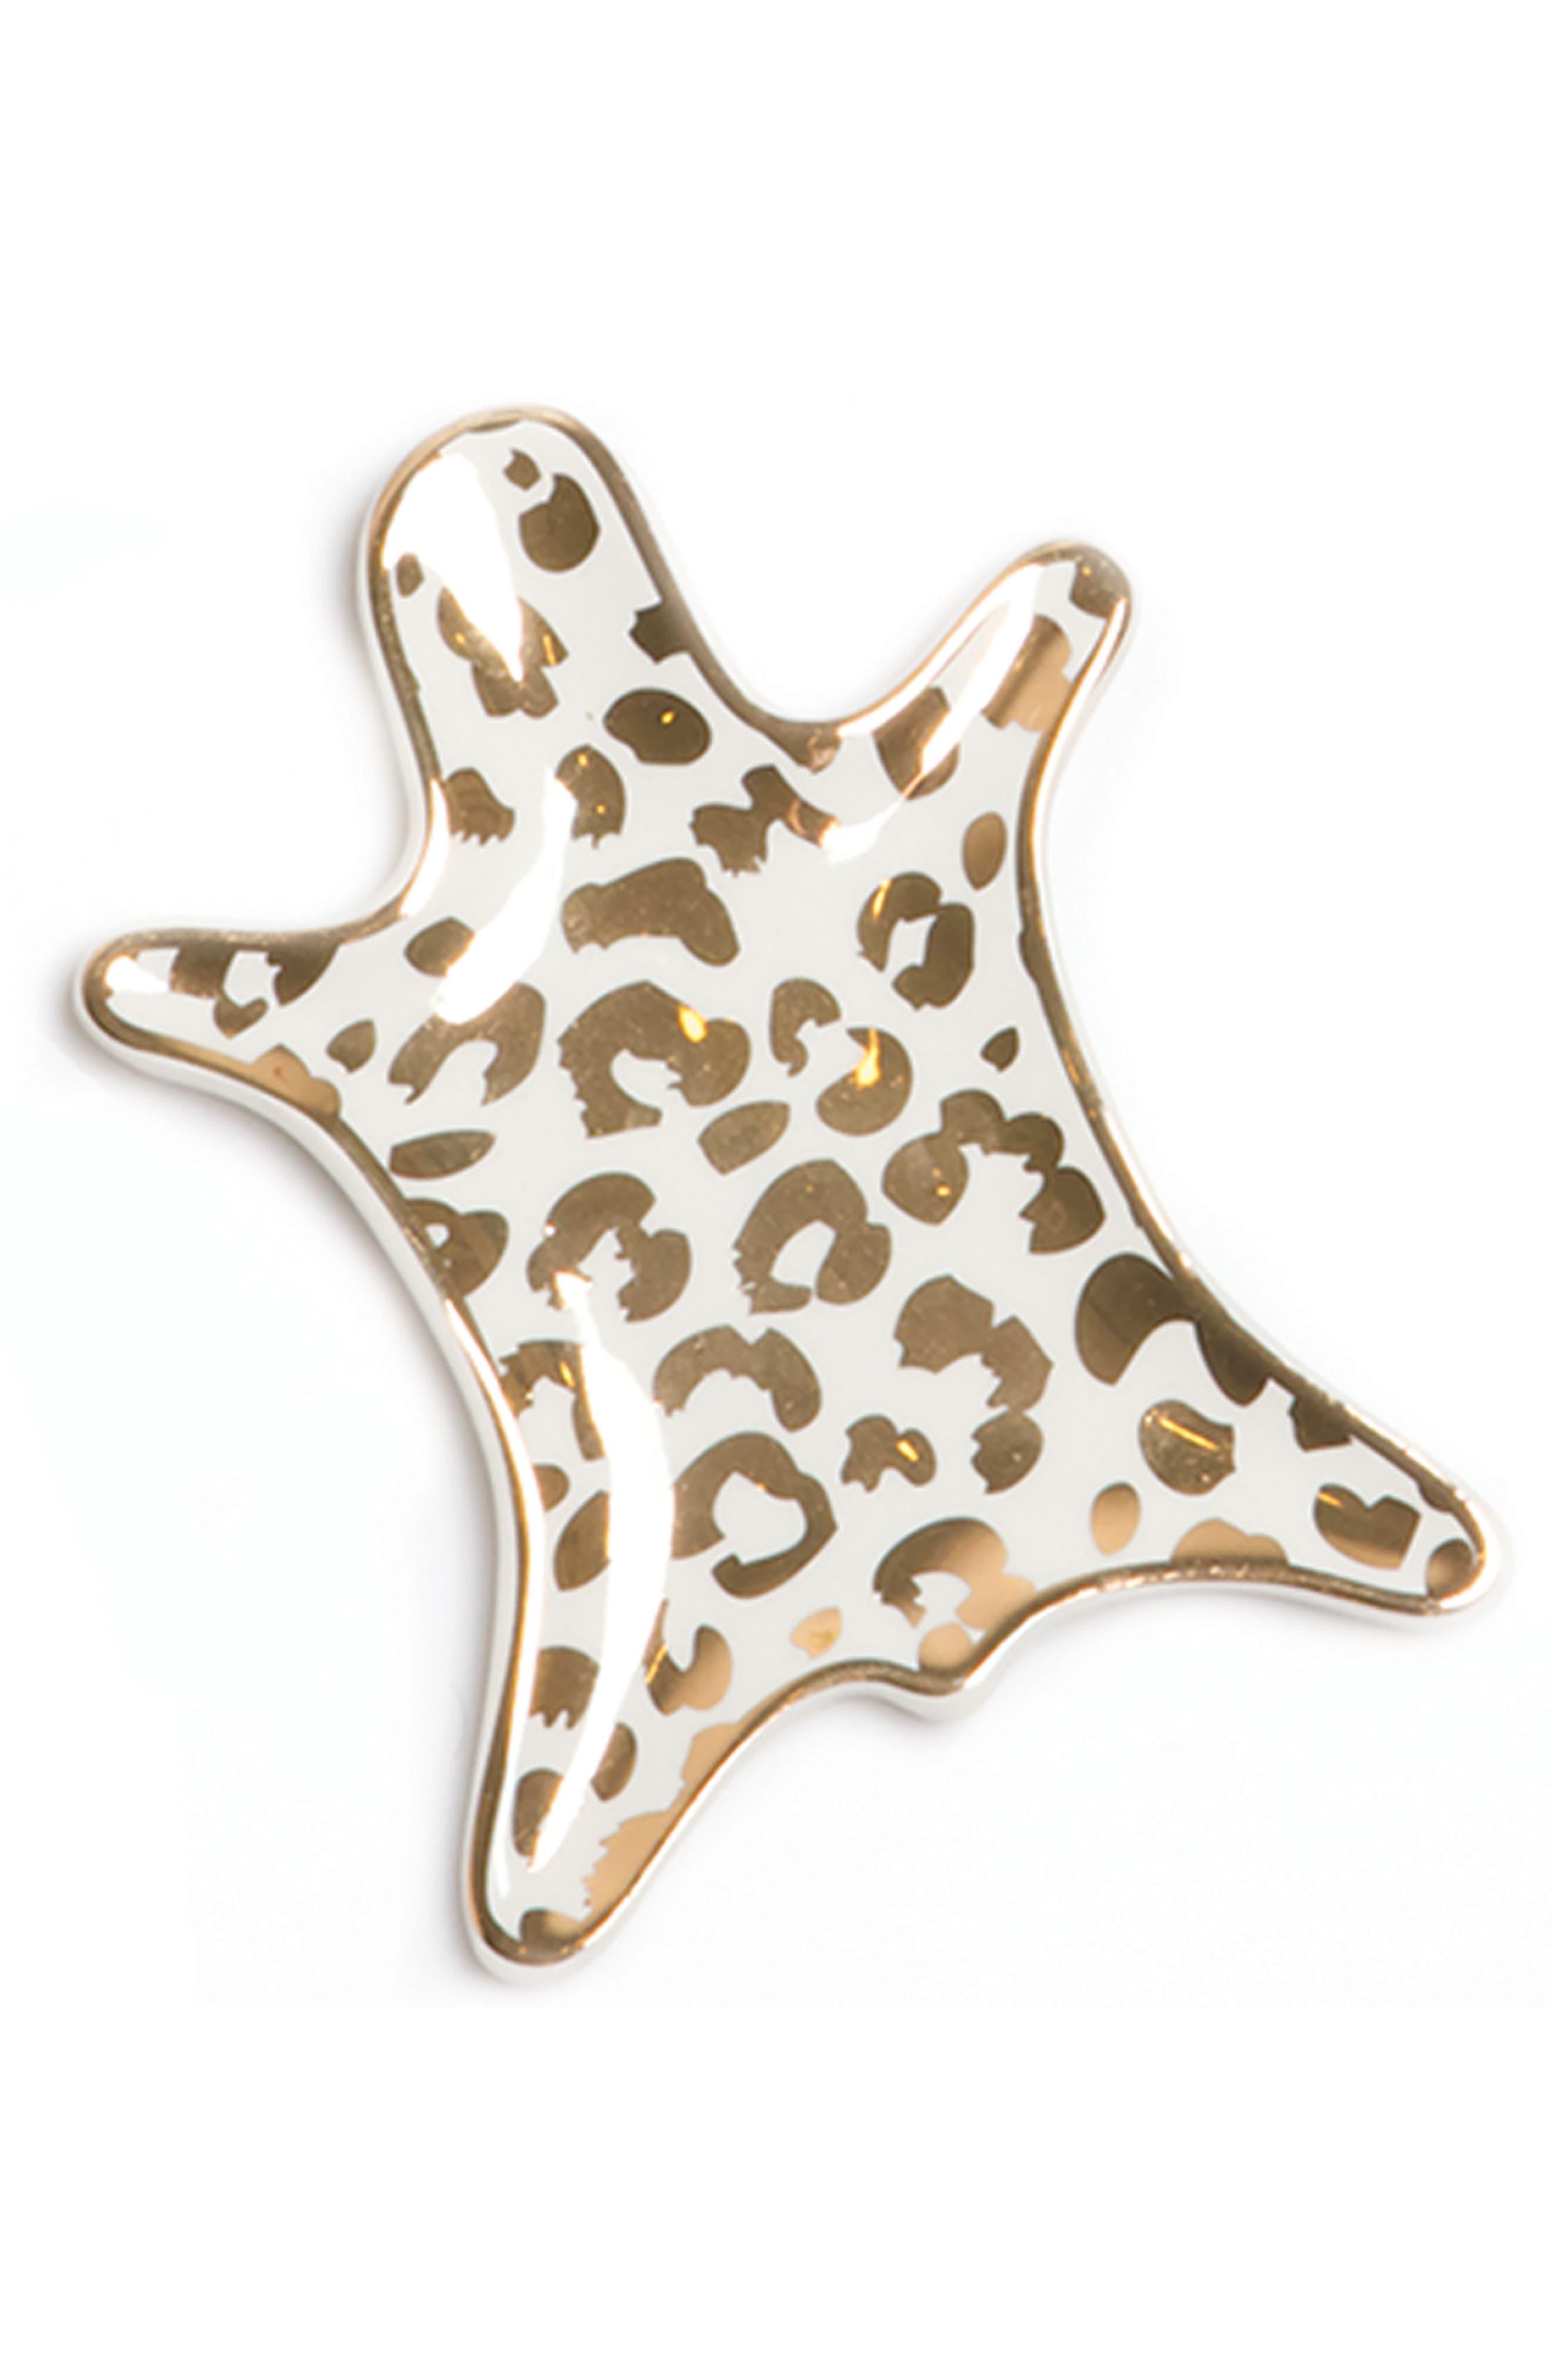 Leopard Ceramic Dish,                         Main,                         color, Gold